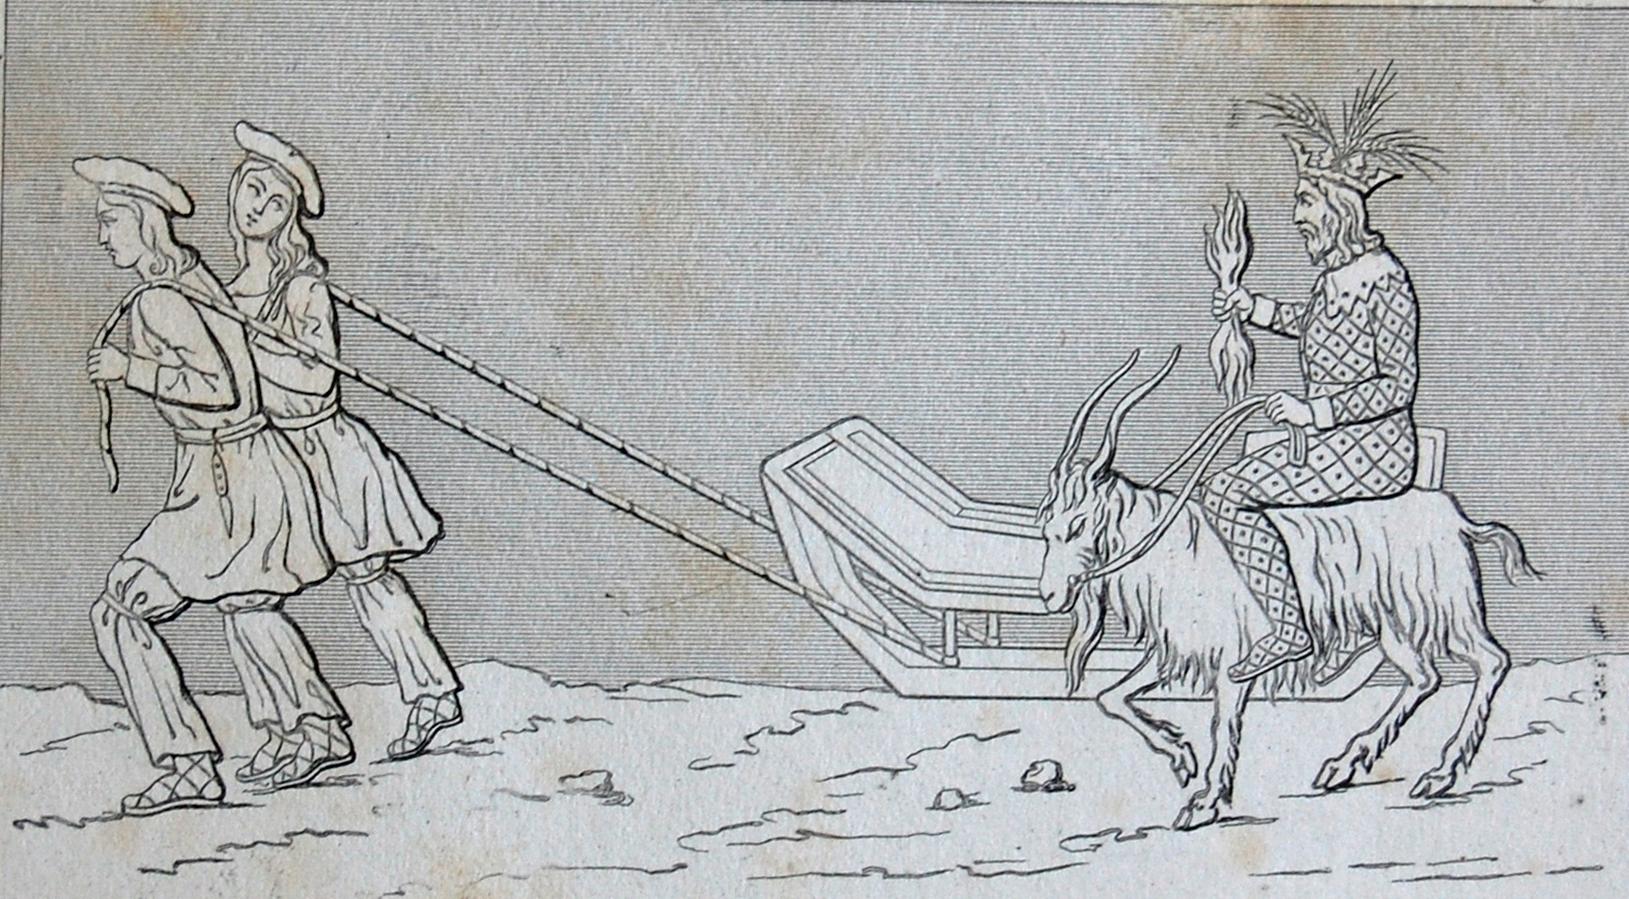 Þórr Riding a Goat